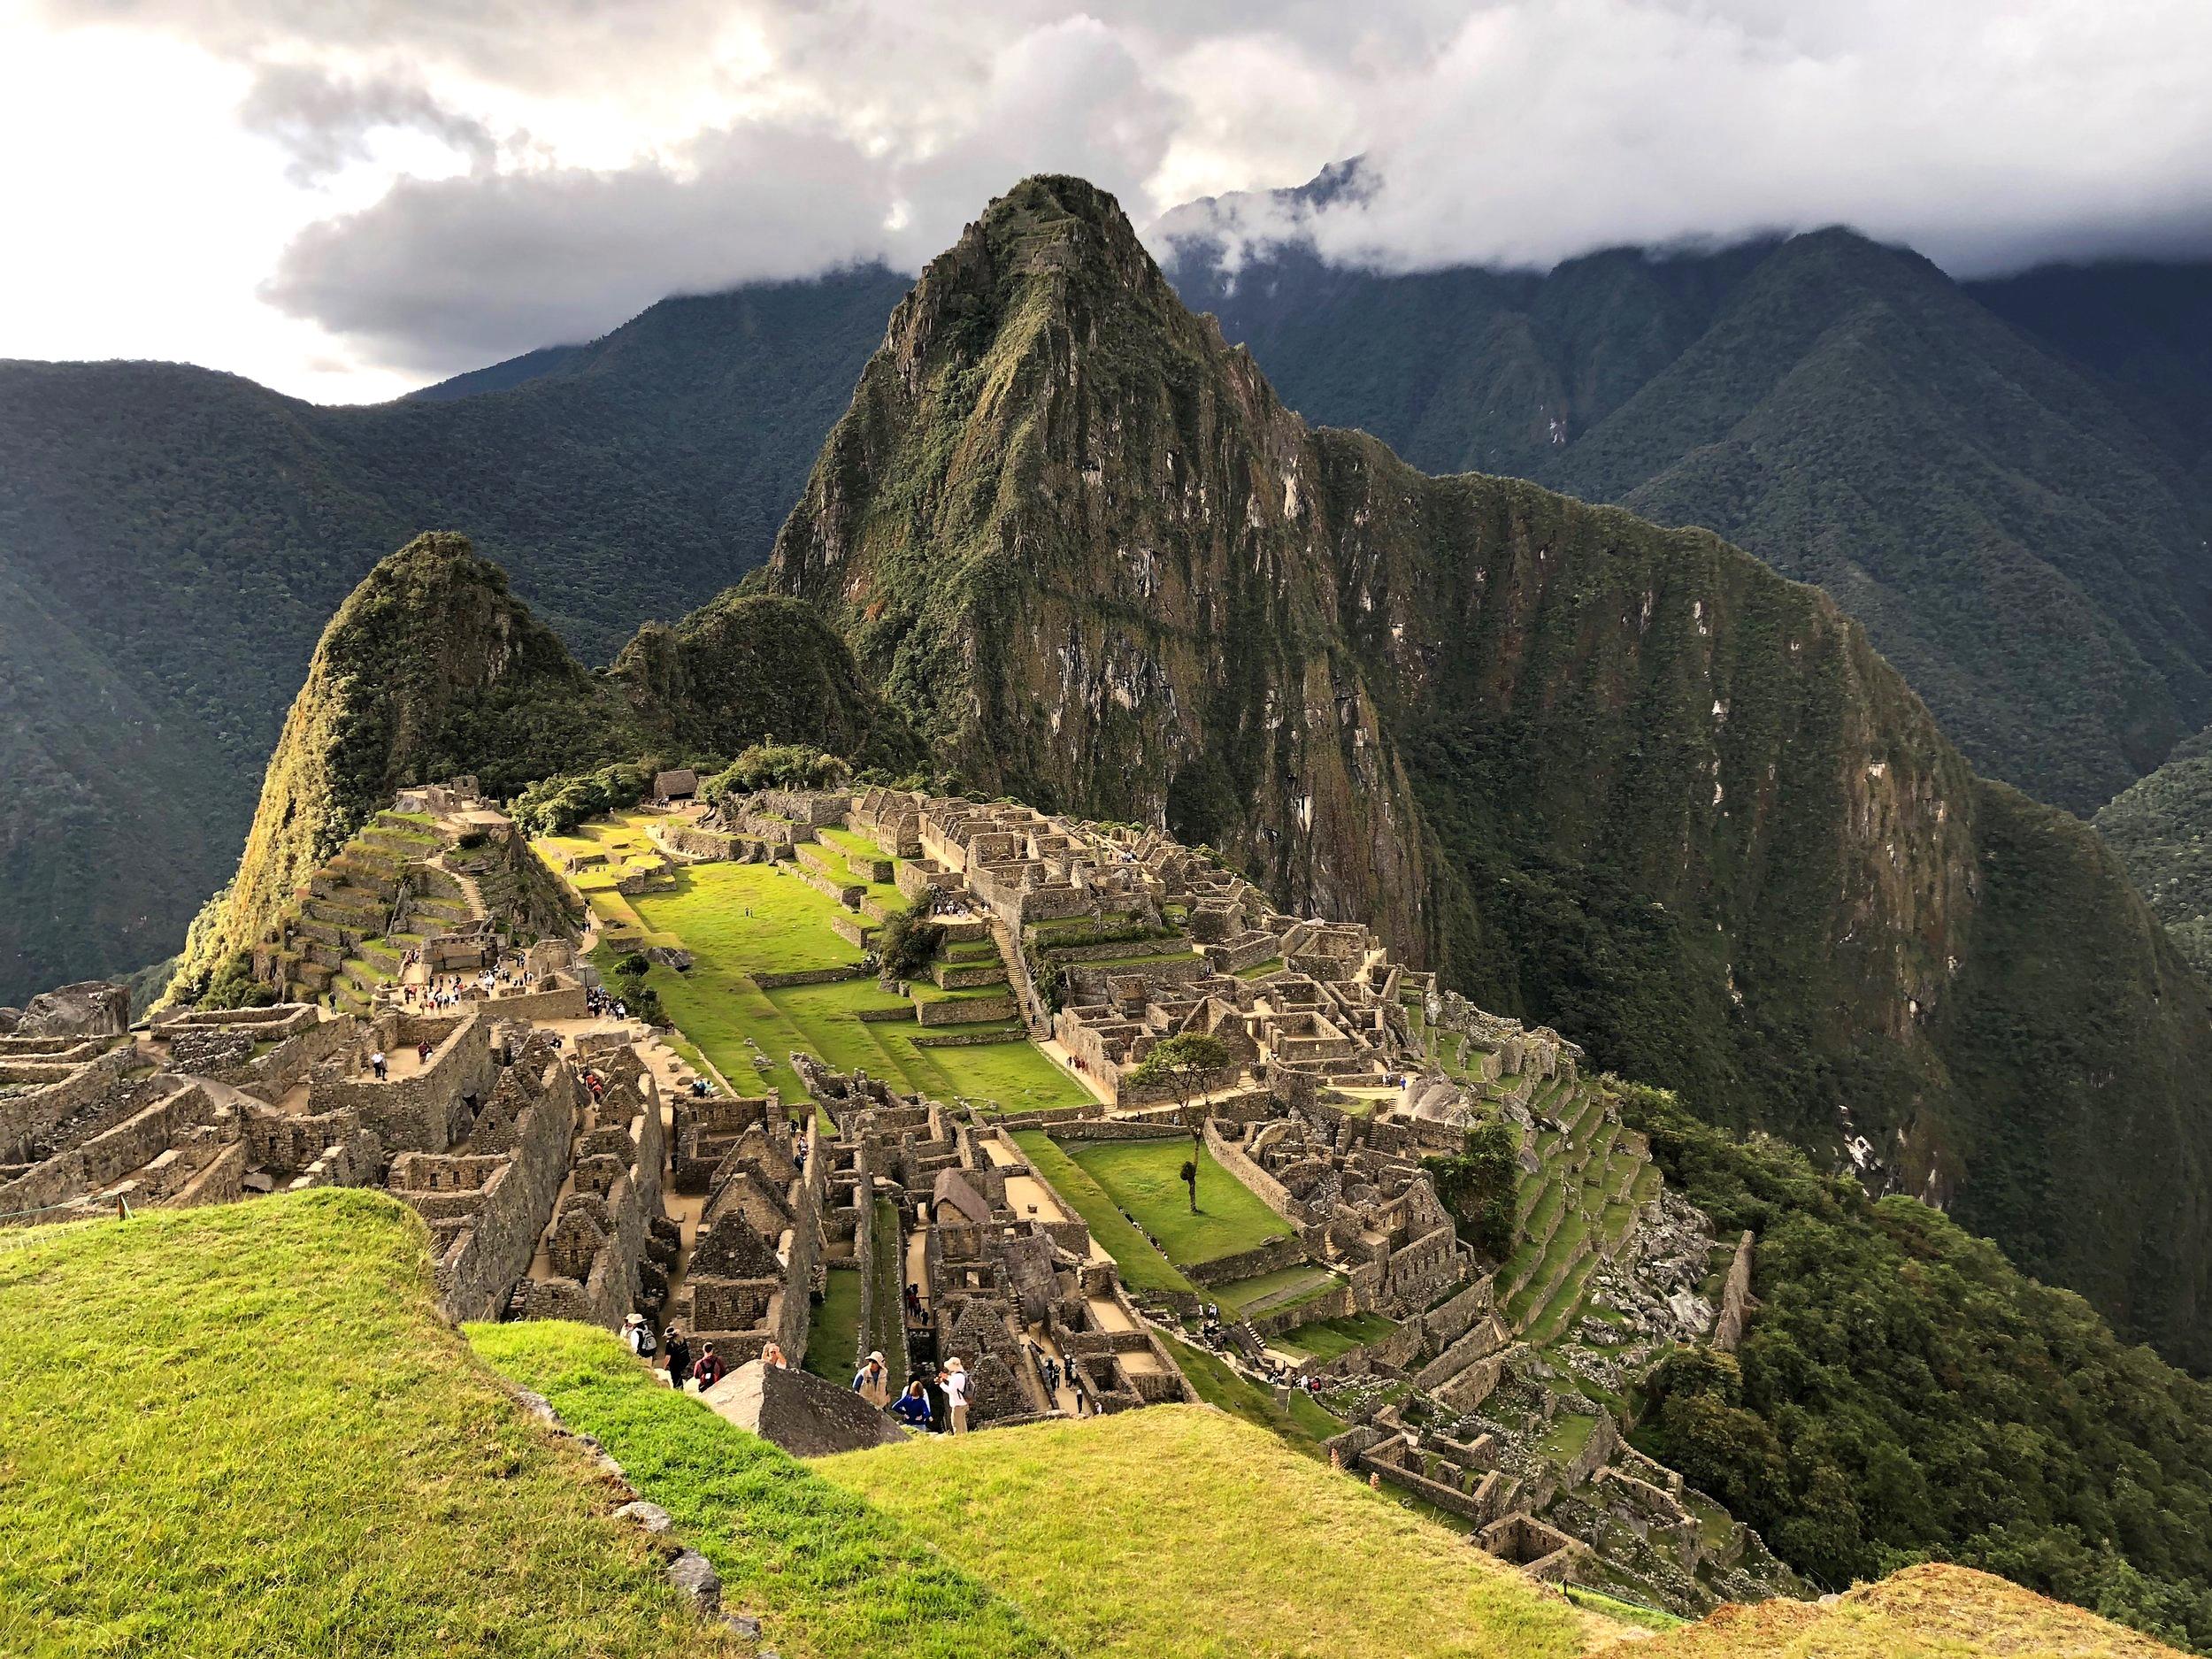 Golden hour at Machu Picchu